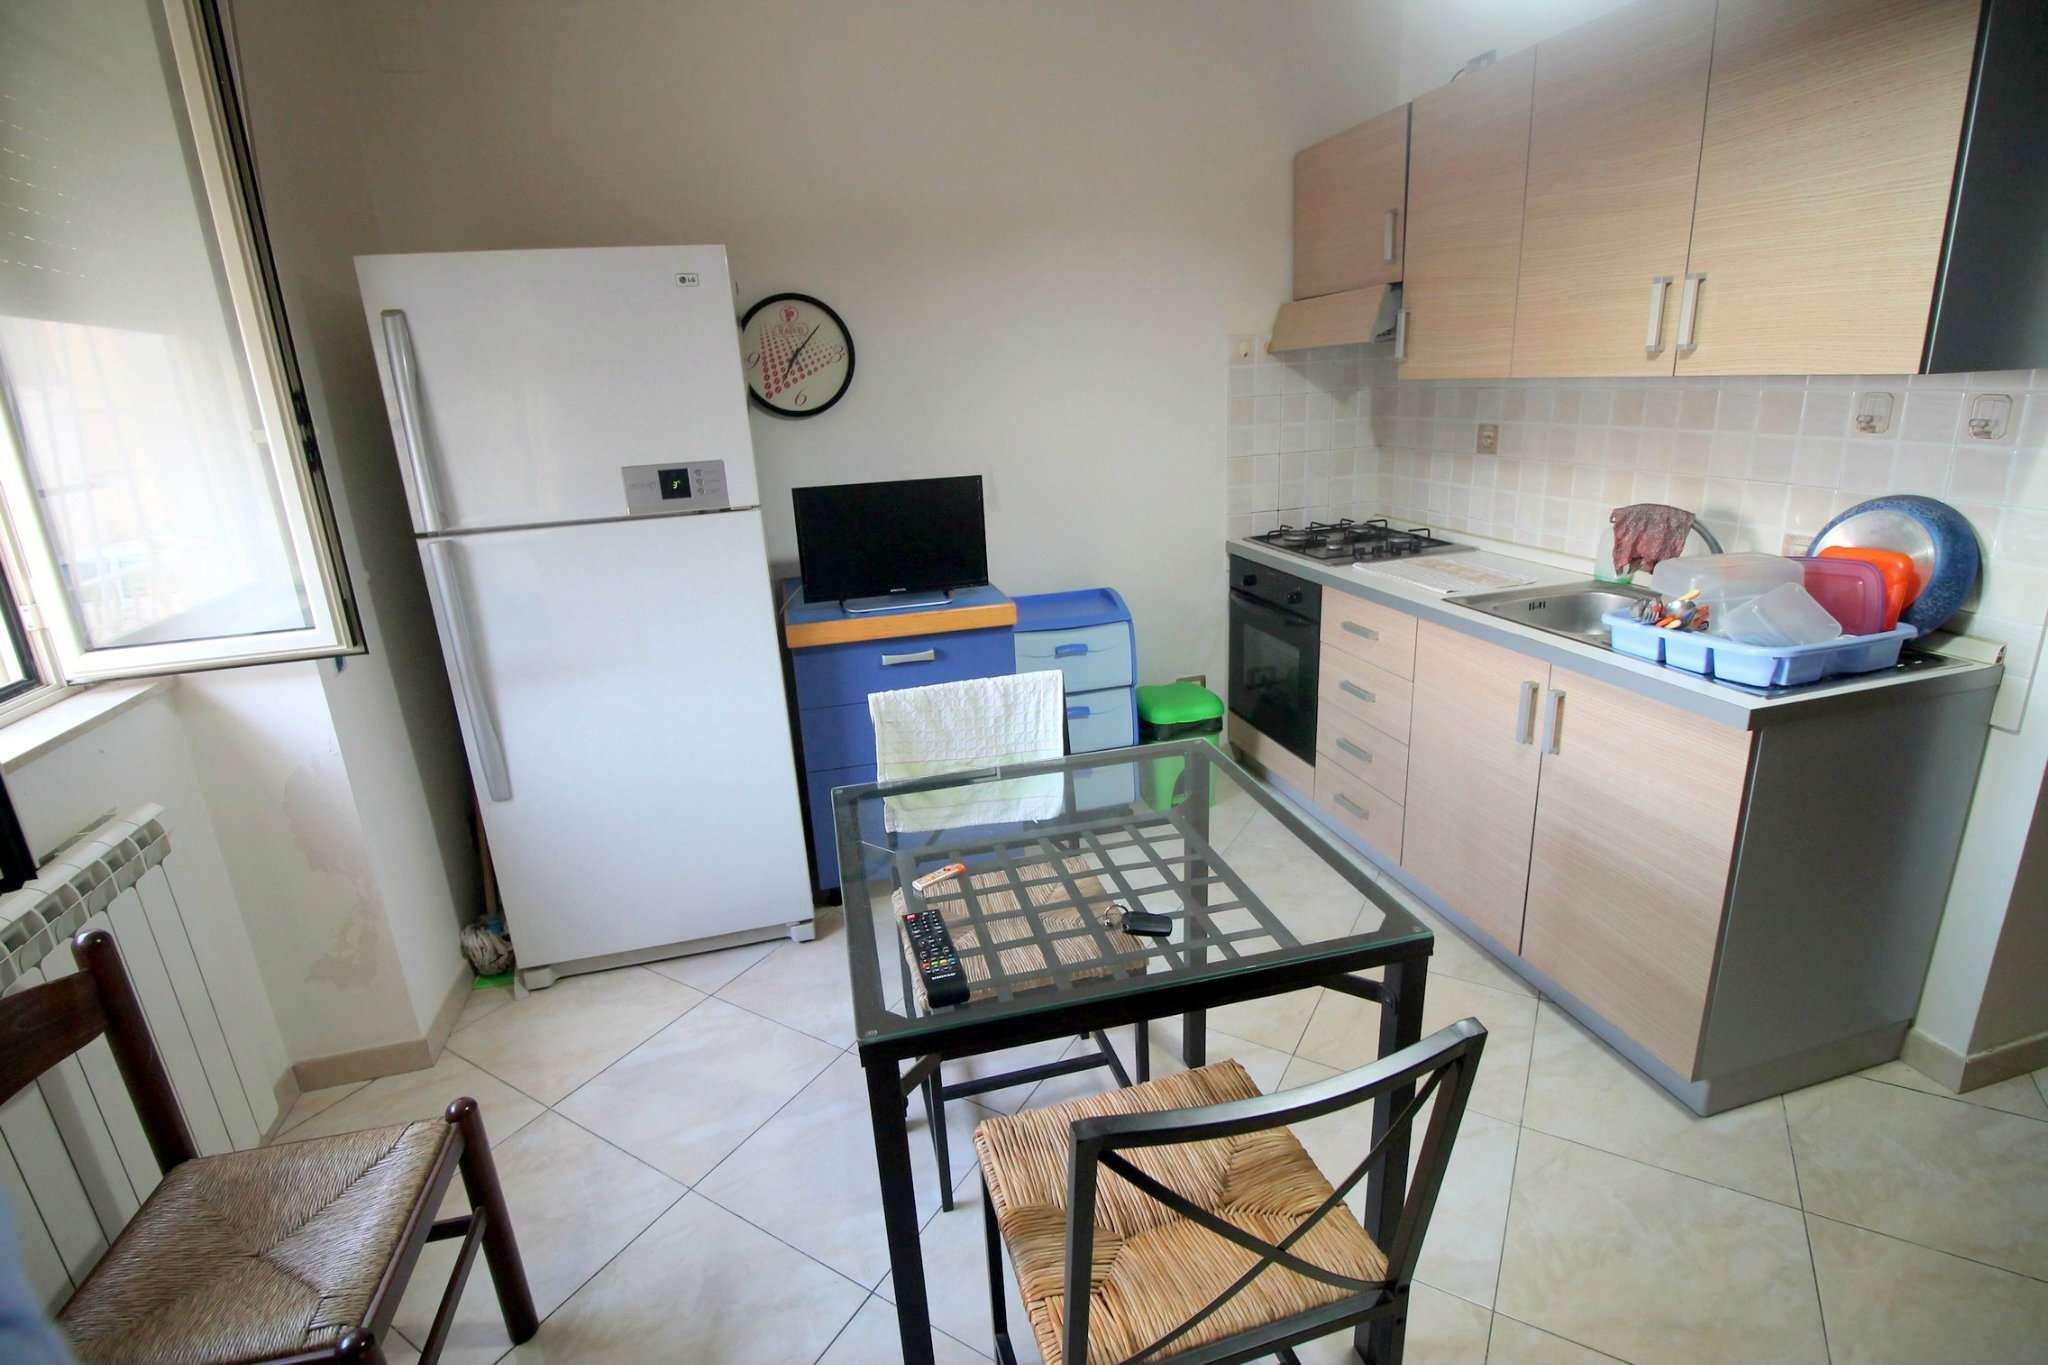 Appartamento bilocale in vendita a Siracusa (SR)